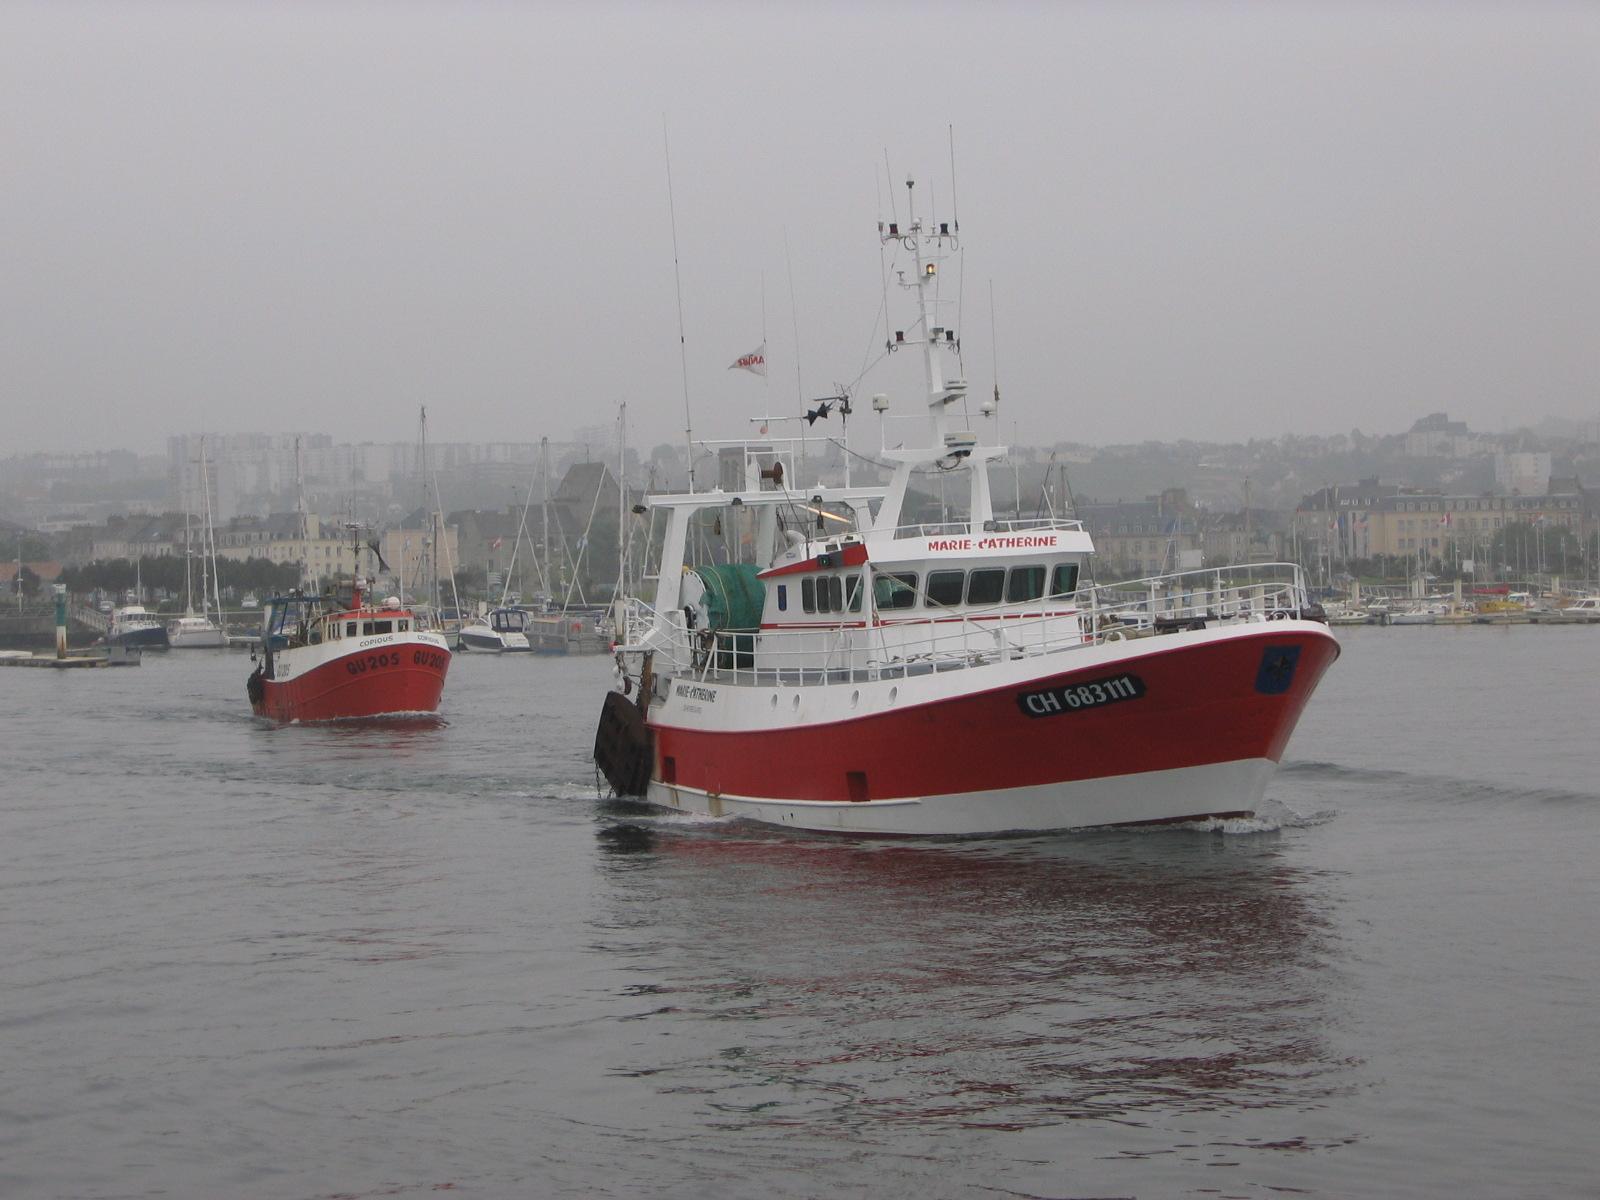 bateau peche cherbourg